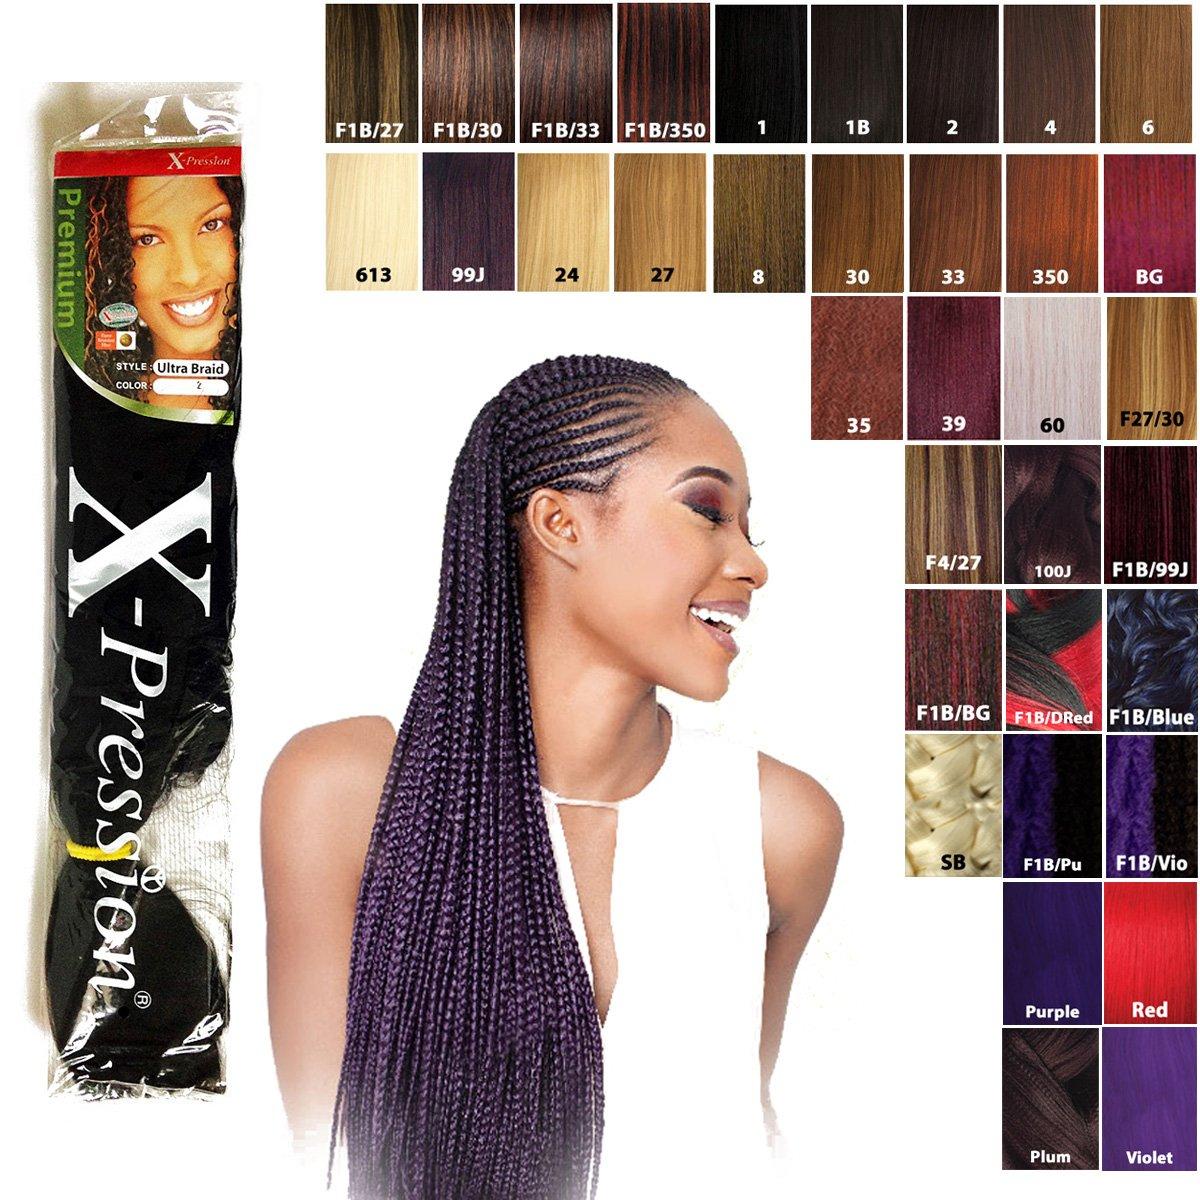 X-Pression Premium Original Ultra Braids (55PCS) - bulk